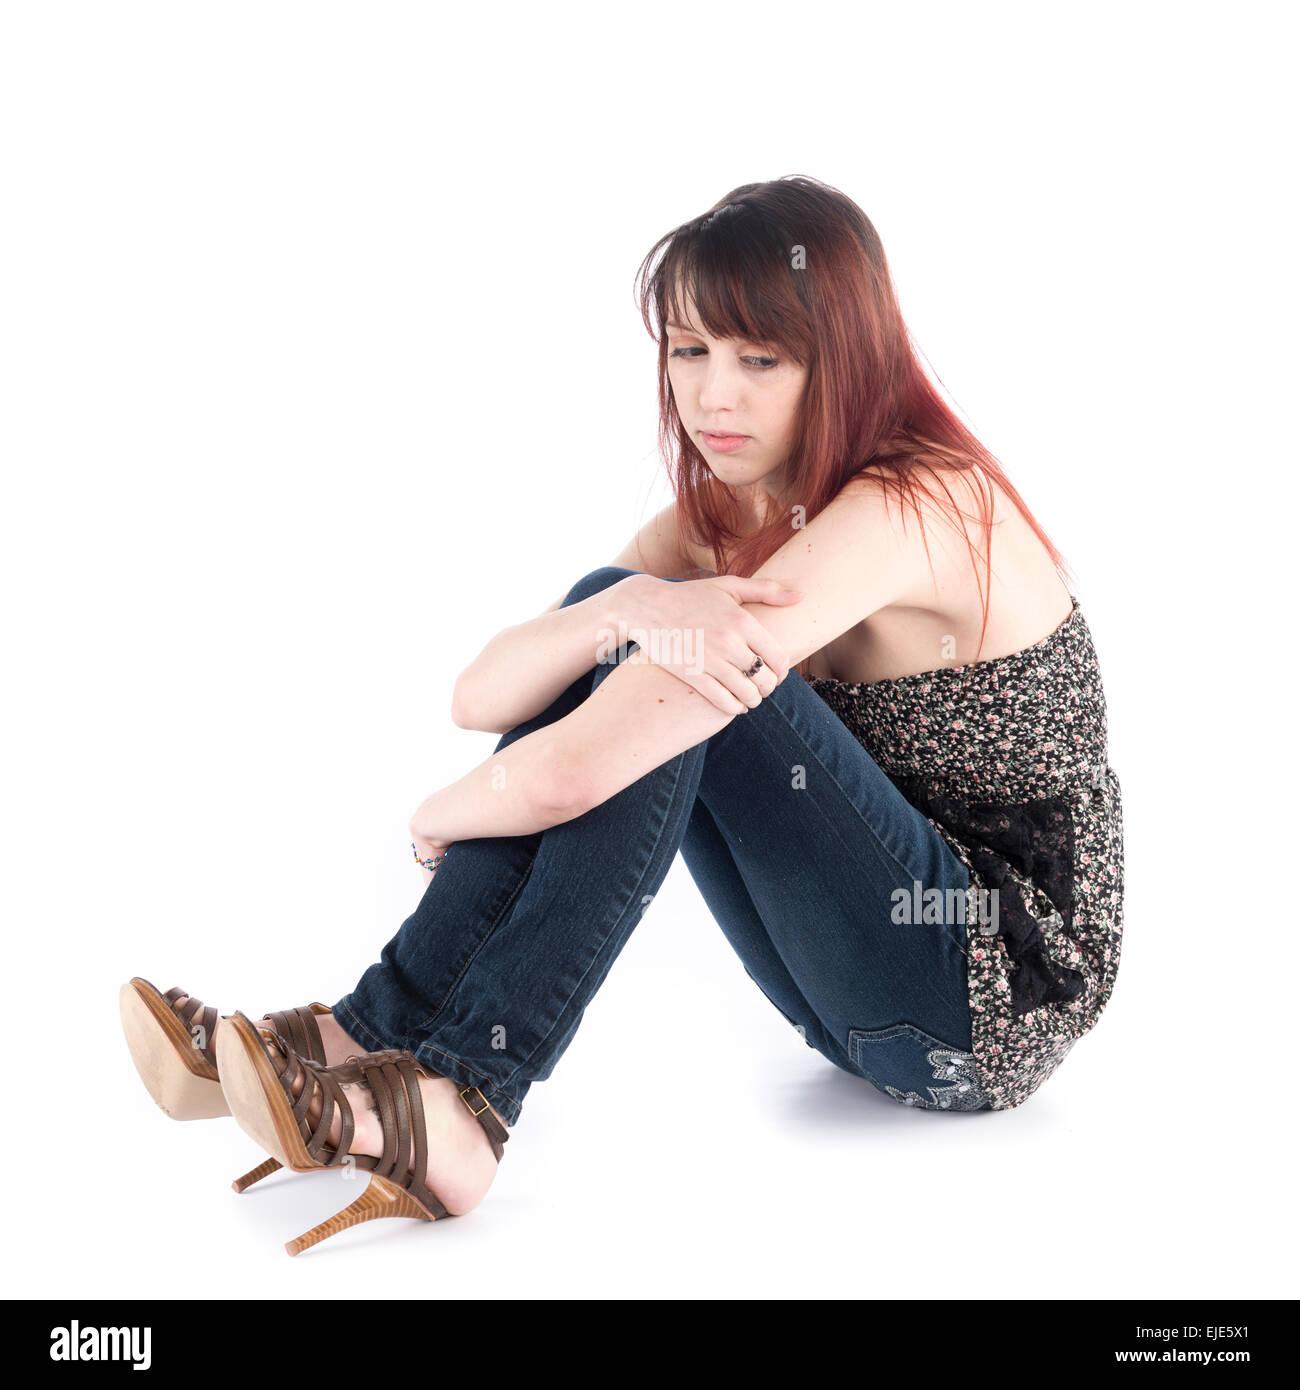 Sad Woman Sitting on the Floor Embracing her Knee - Stock Image